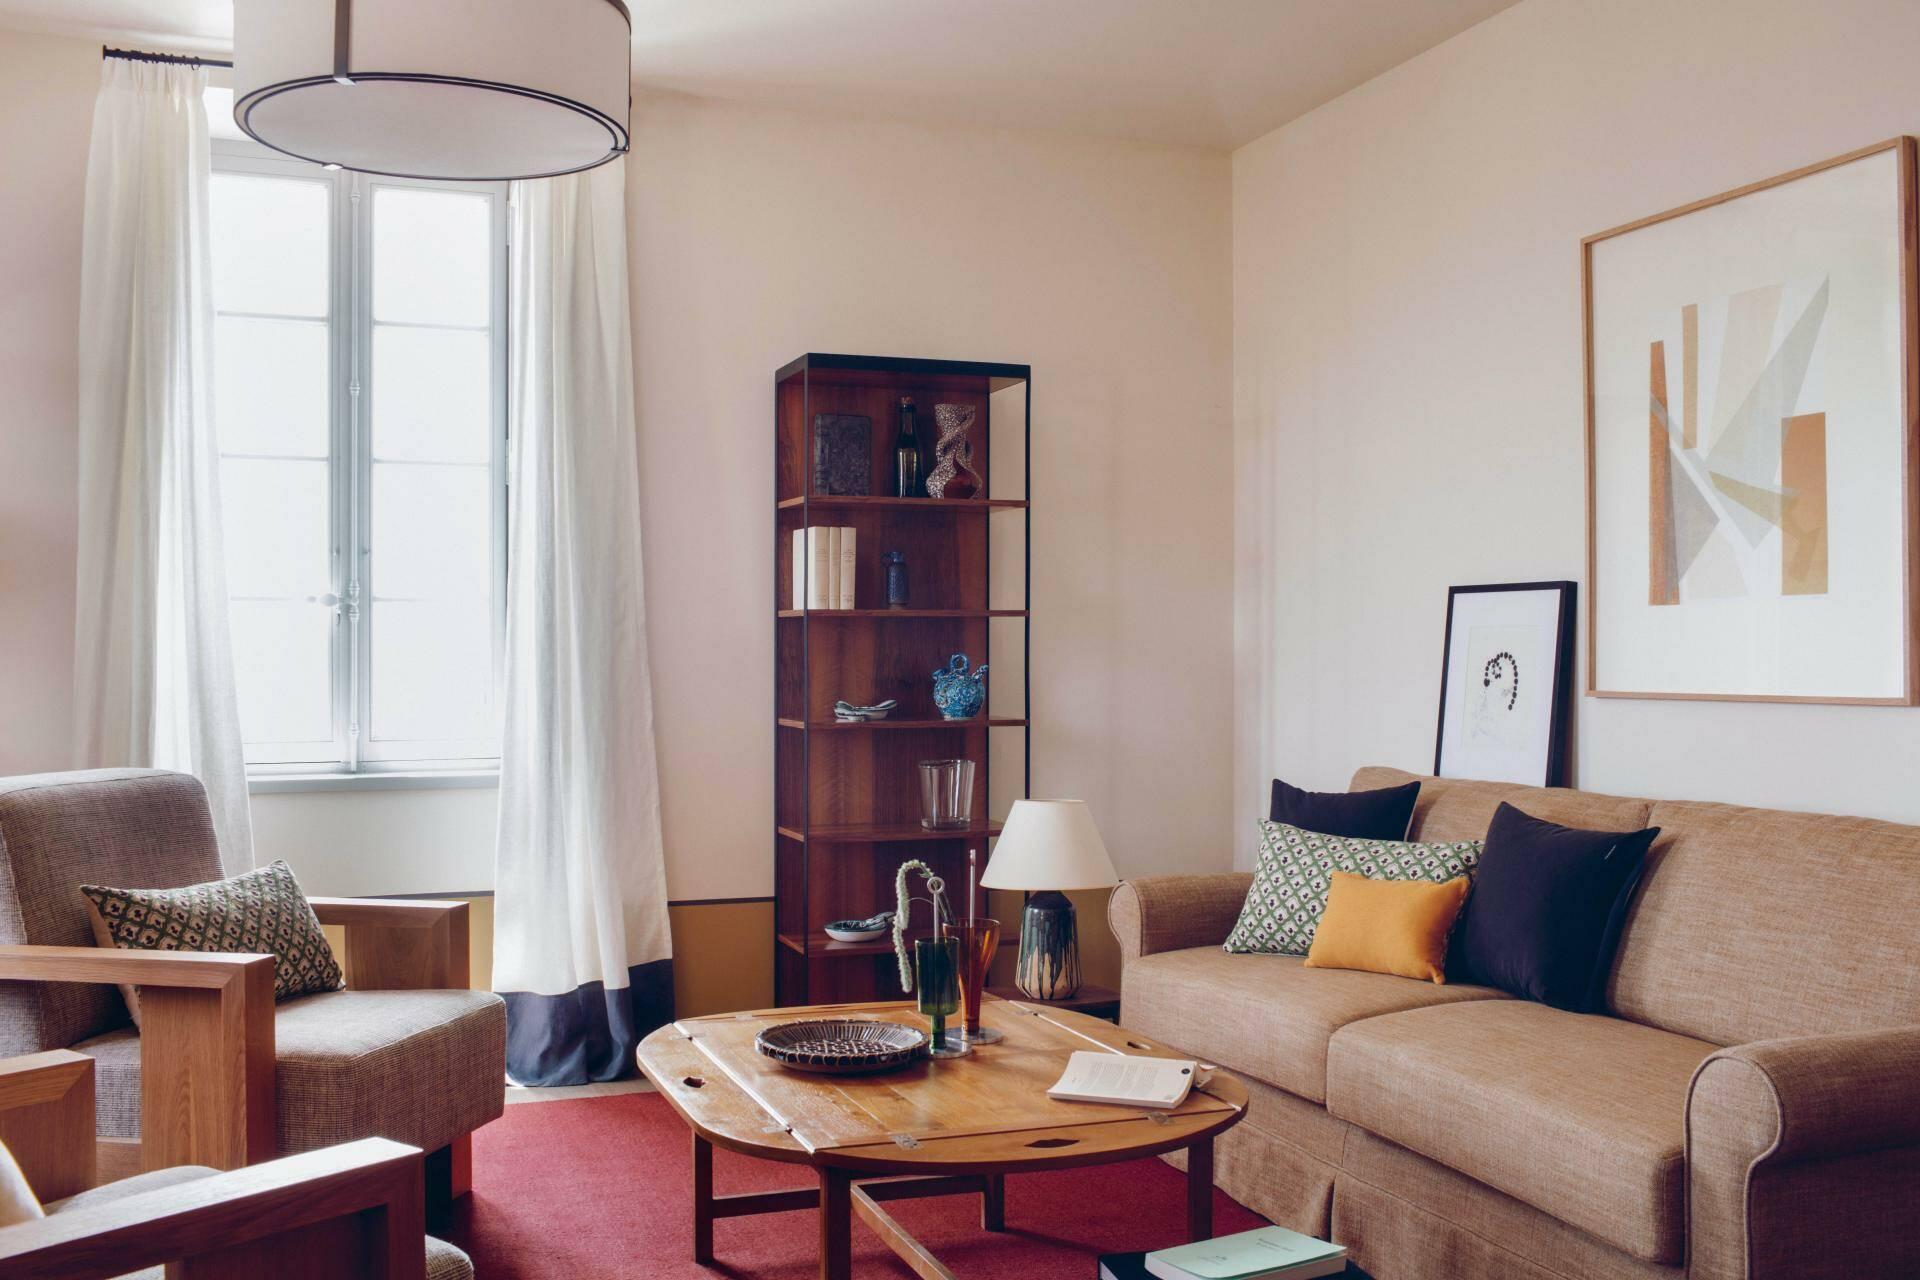 Hotel crillon le brave chambre Salon Provence Maisons Pariente